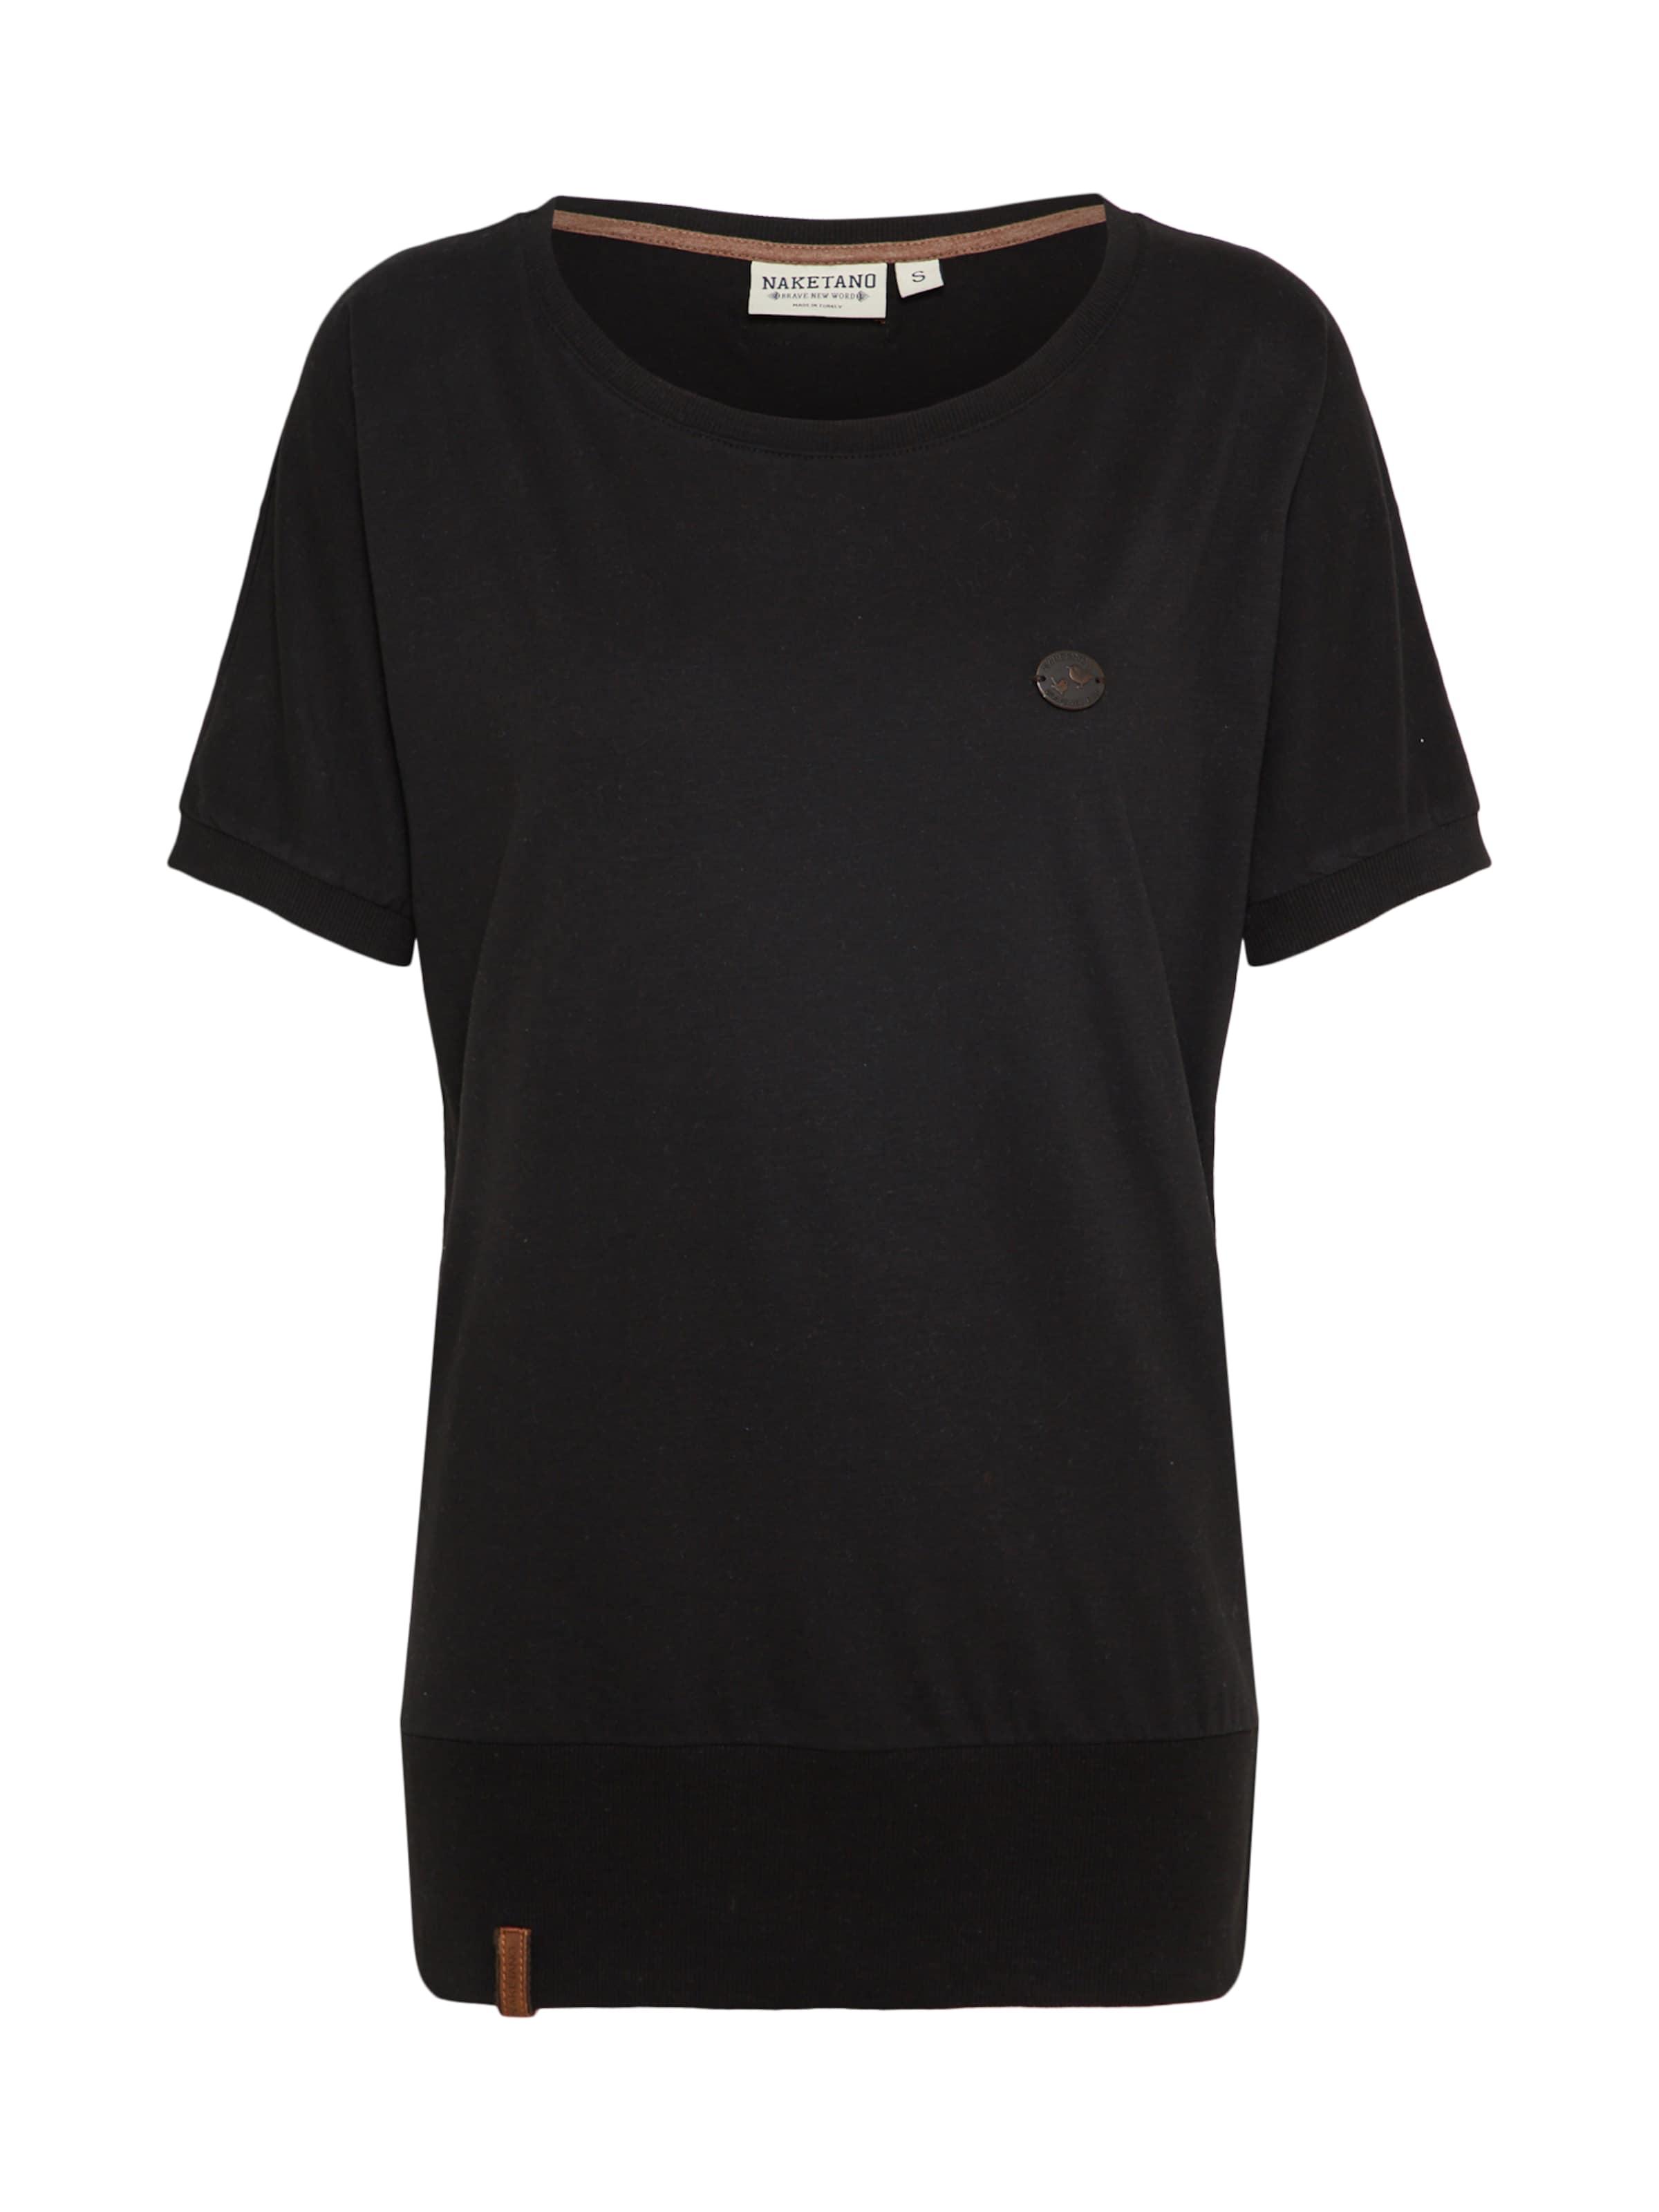 shirt Wit Indigo It' Naketano 'baunxxx En T wvO0ymN8n